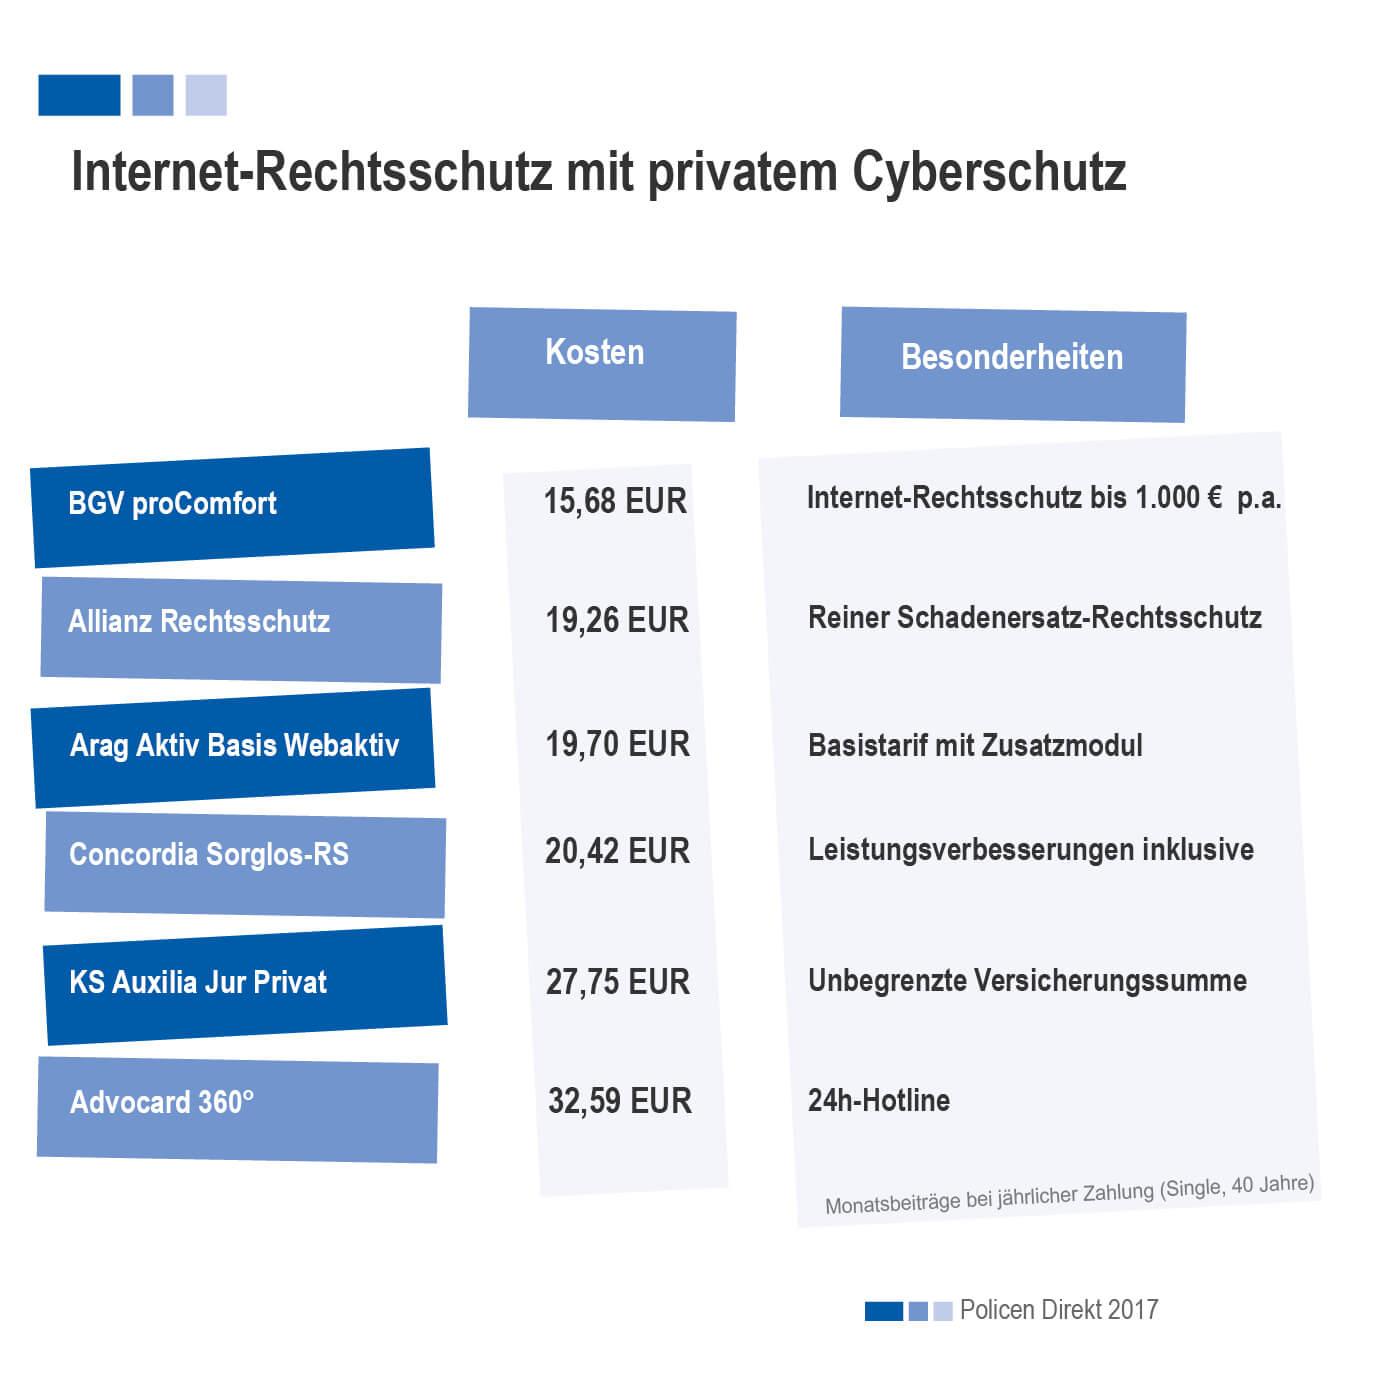 Bild_rechtsschutz internet liste magazin